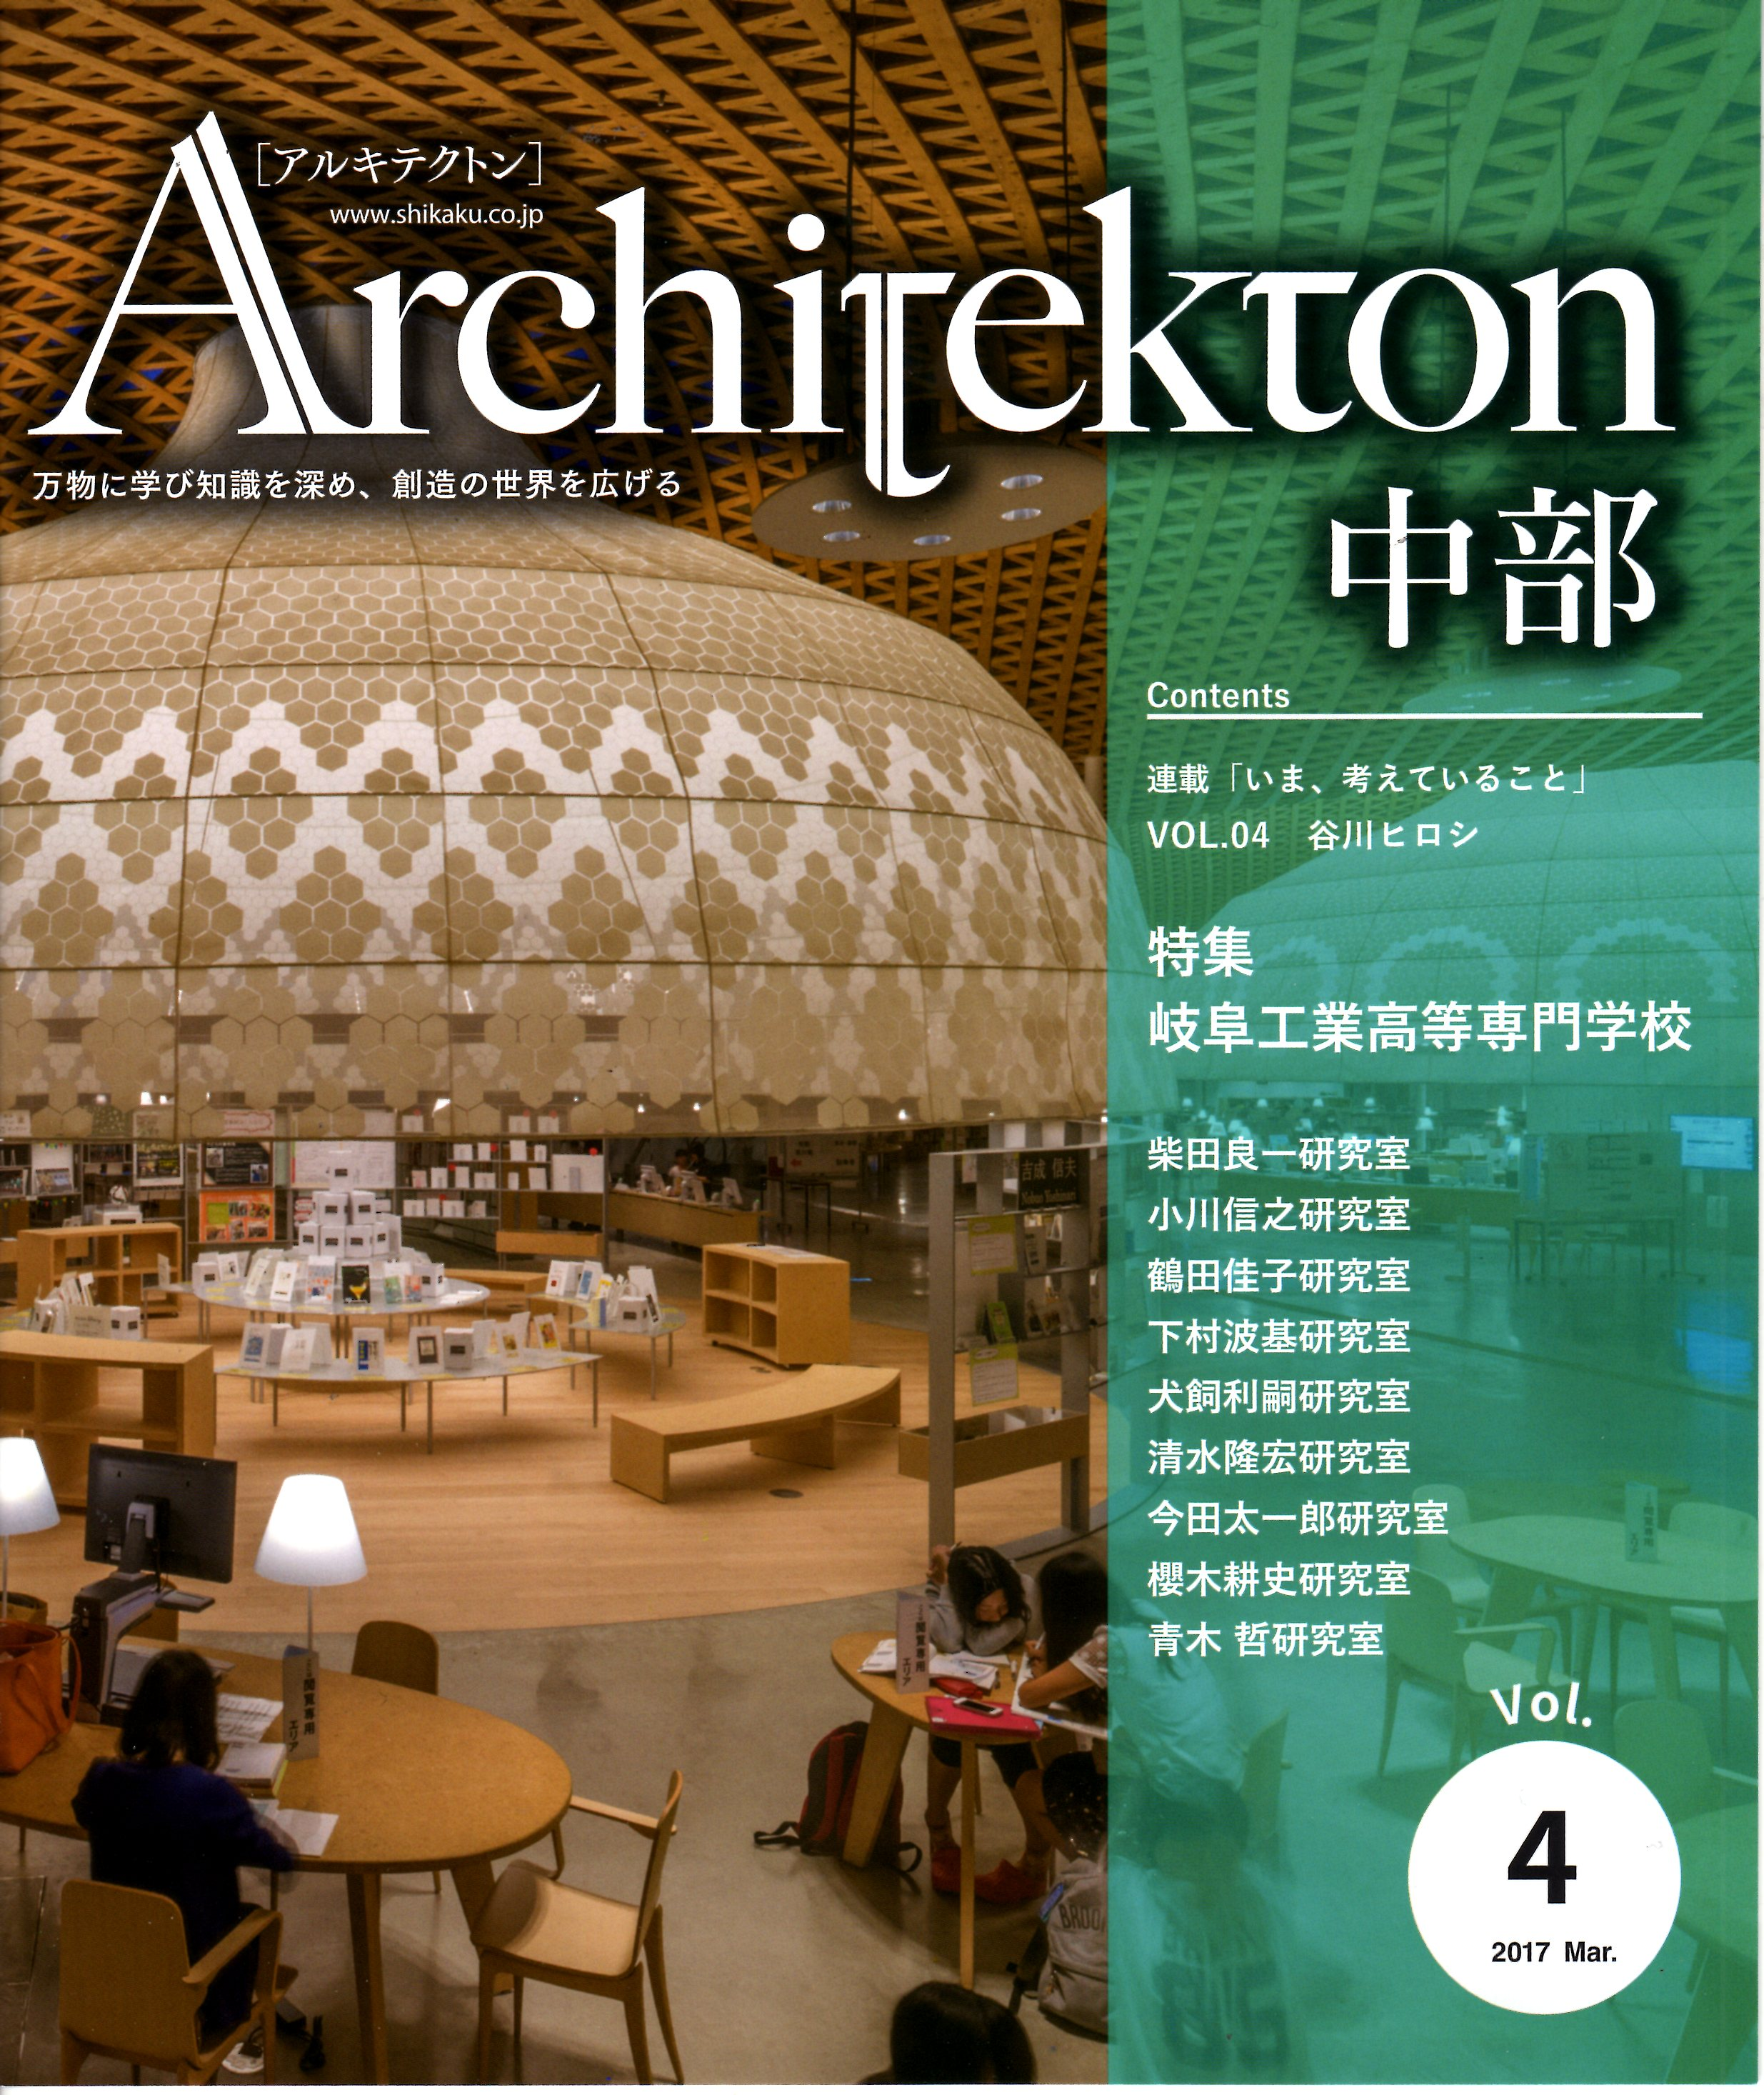 Architeckton 中部 vol.4